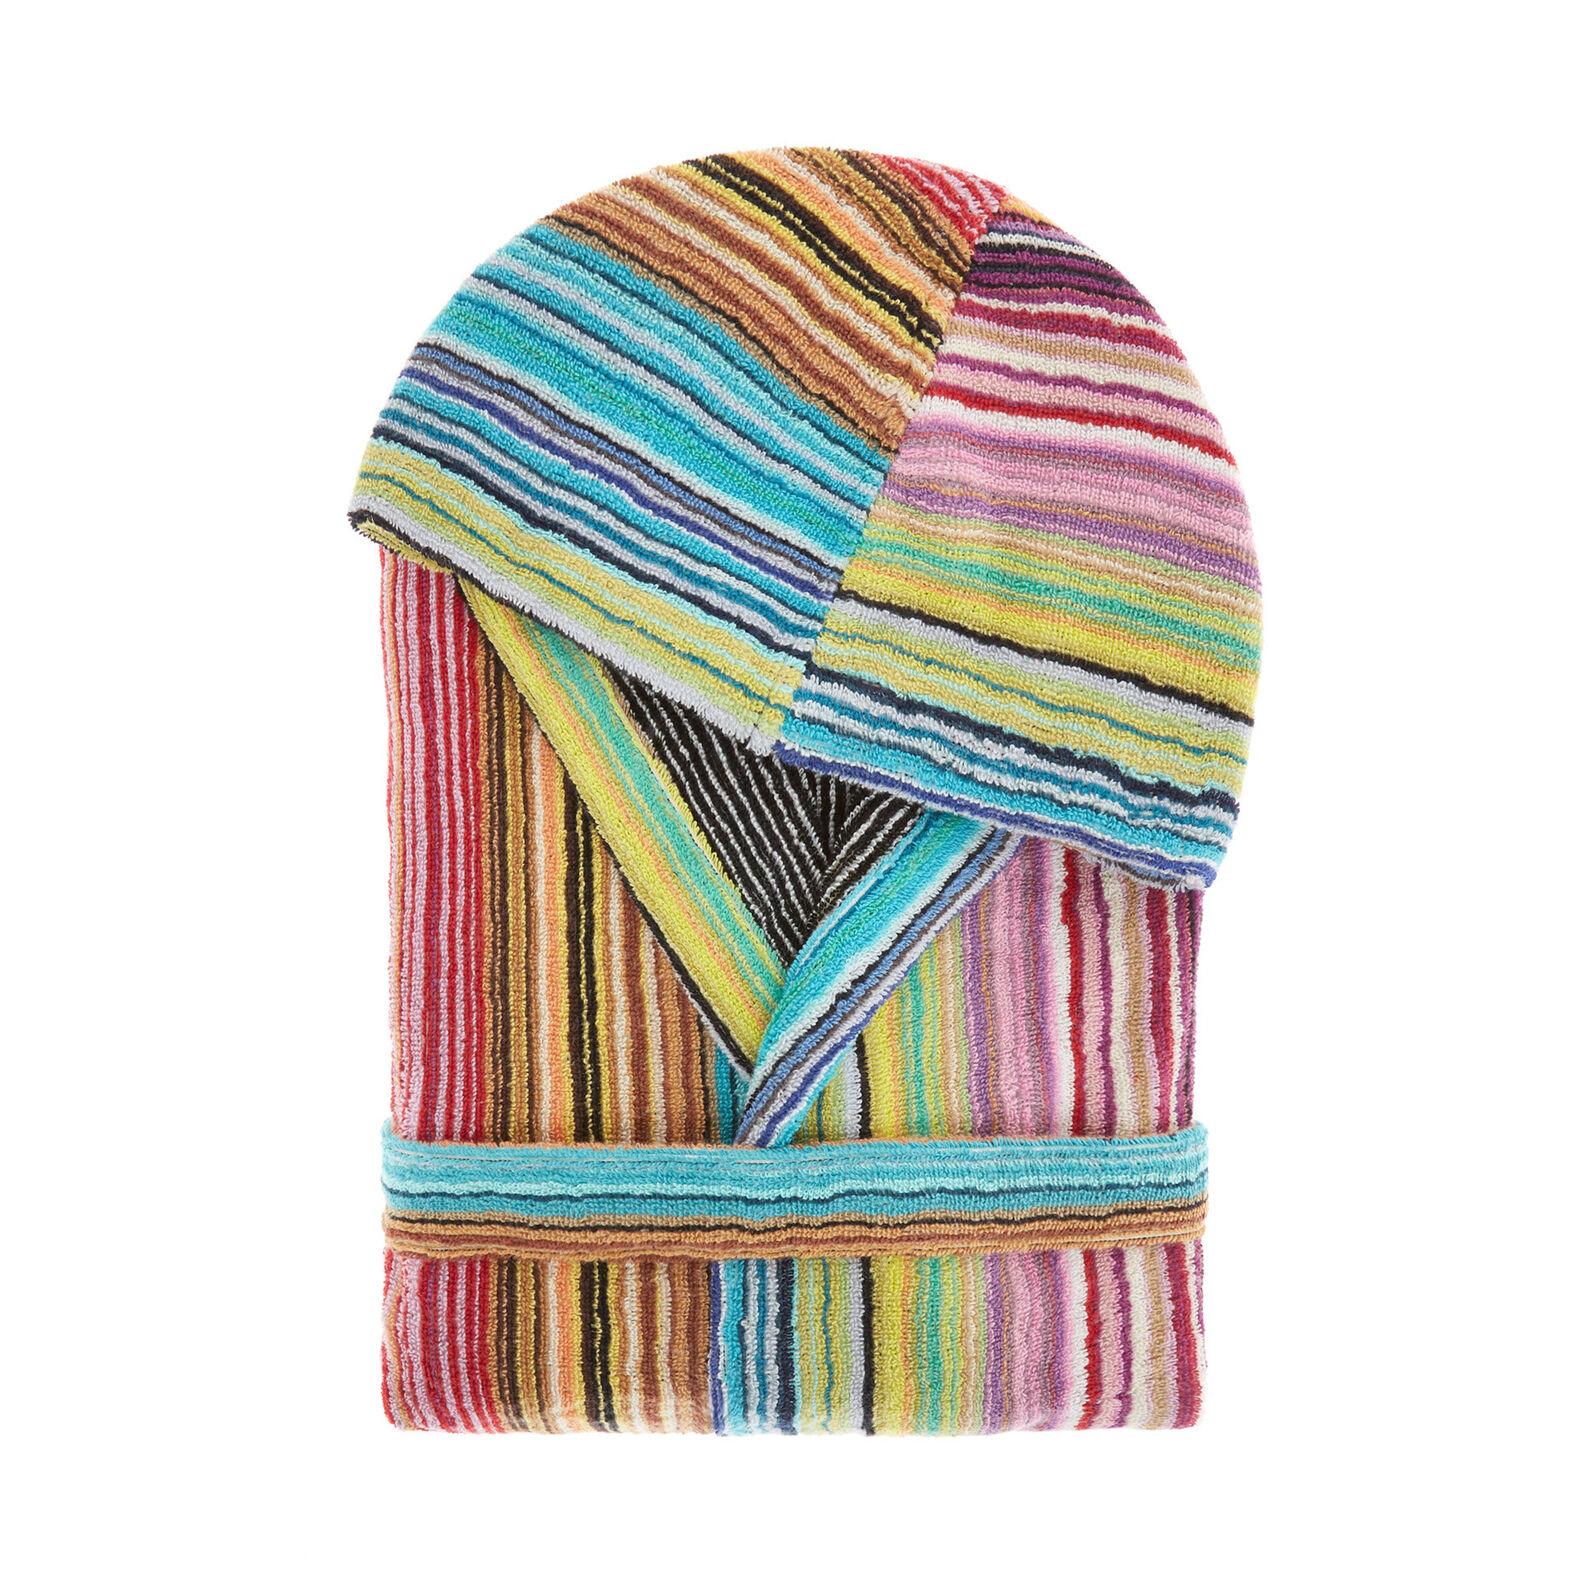 Multiple-striped pure cotton jacquard bathrobe